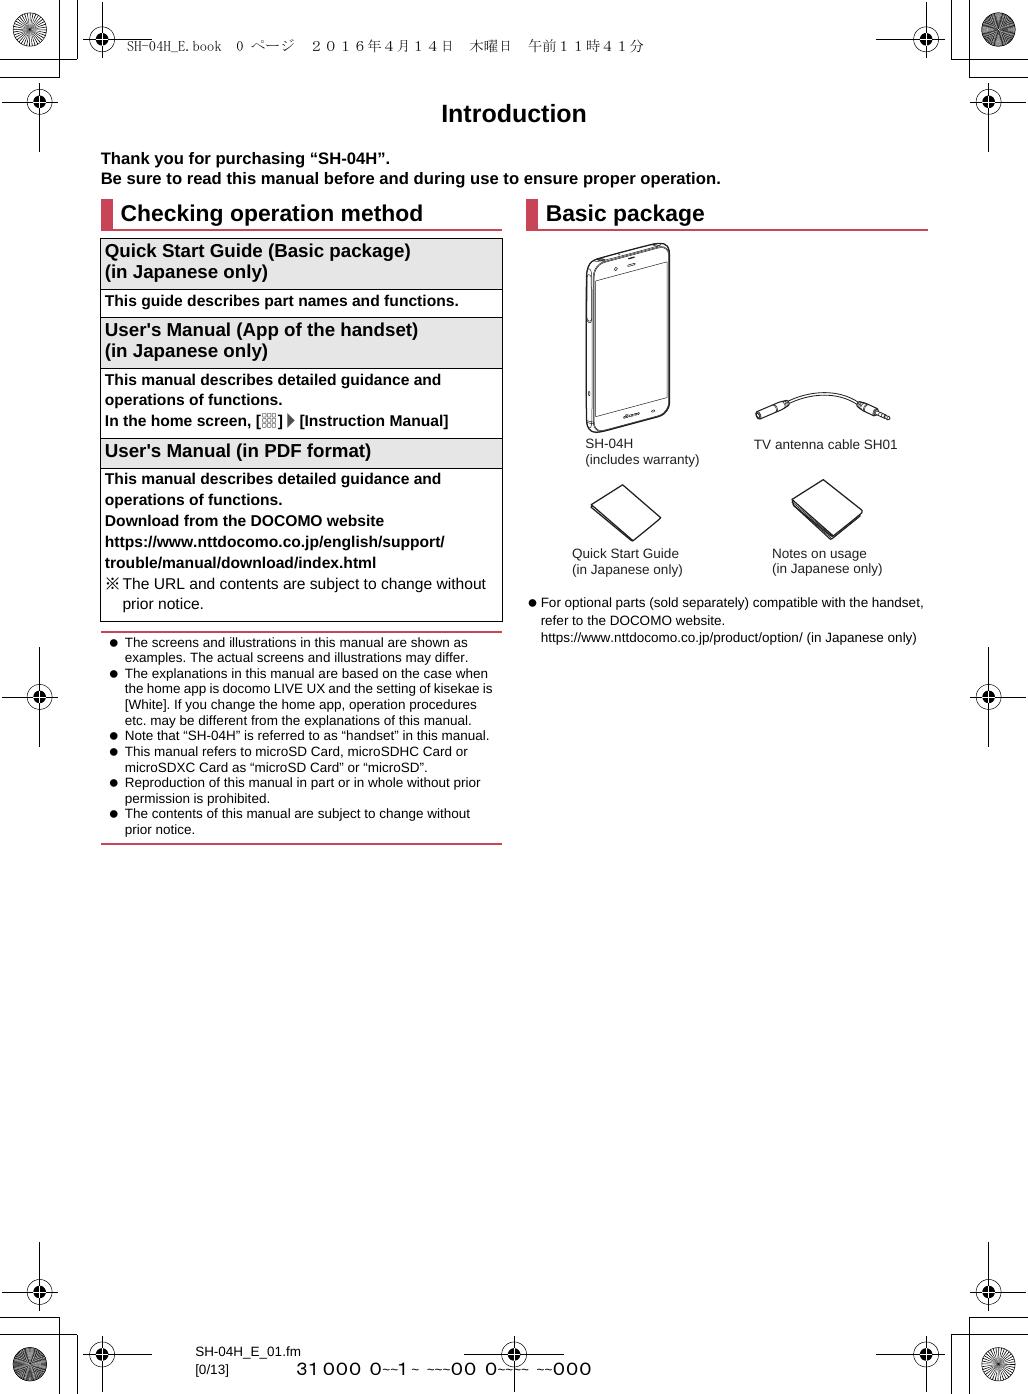 maple 13 user guide various owner manual guide u2022 rh justk co Resource Manual Help Creating a Manual